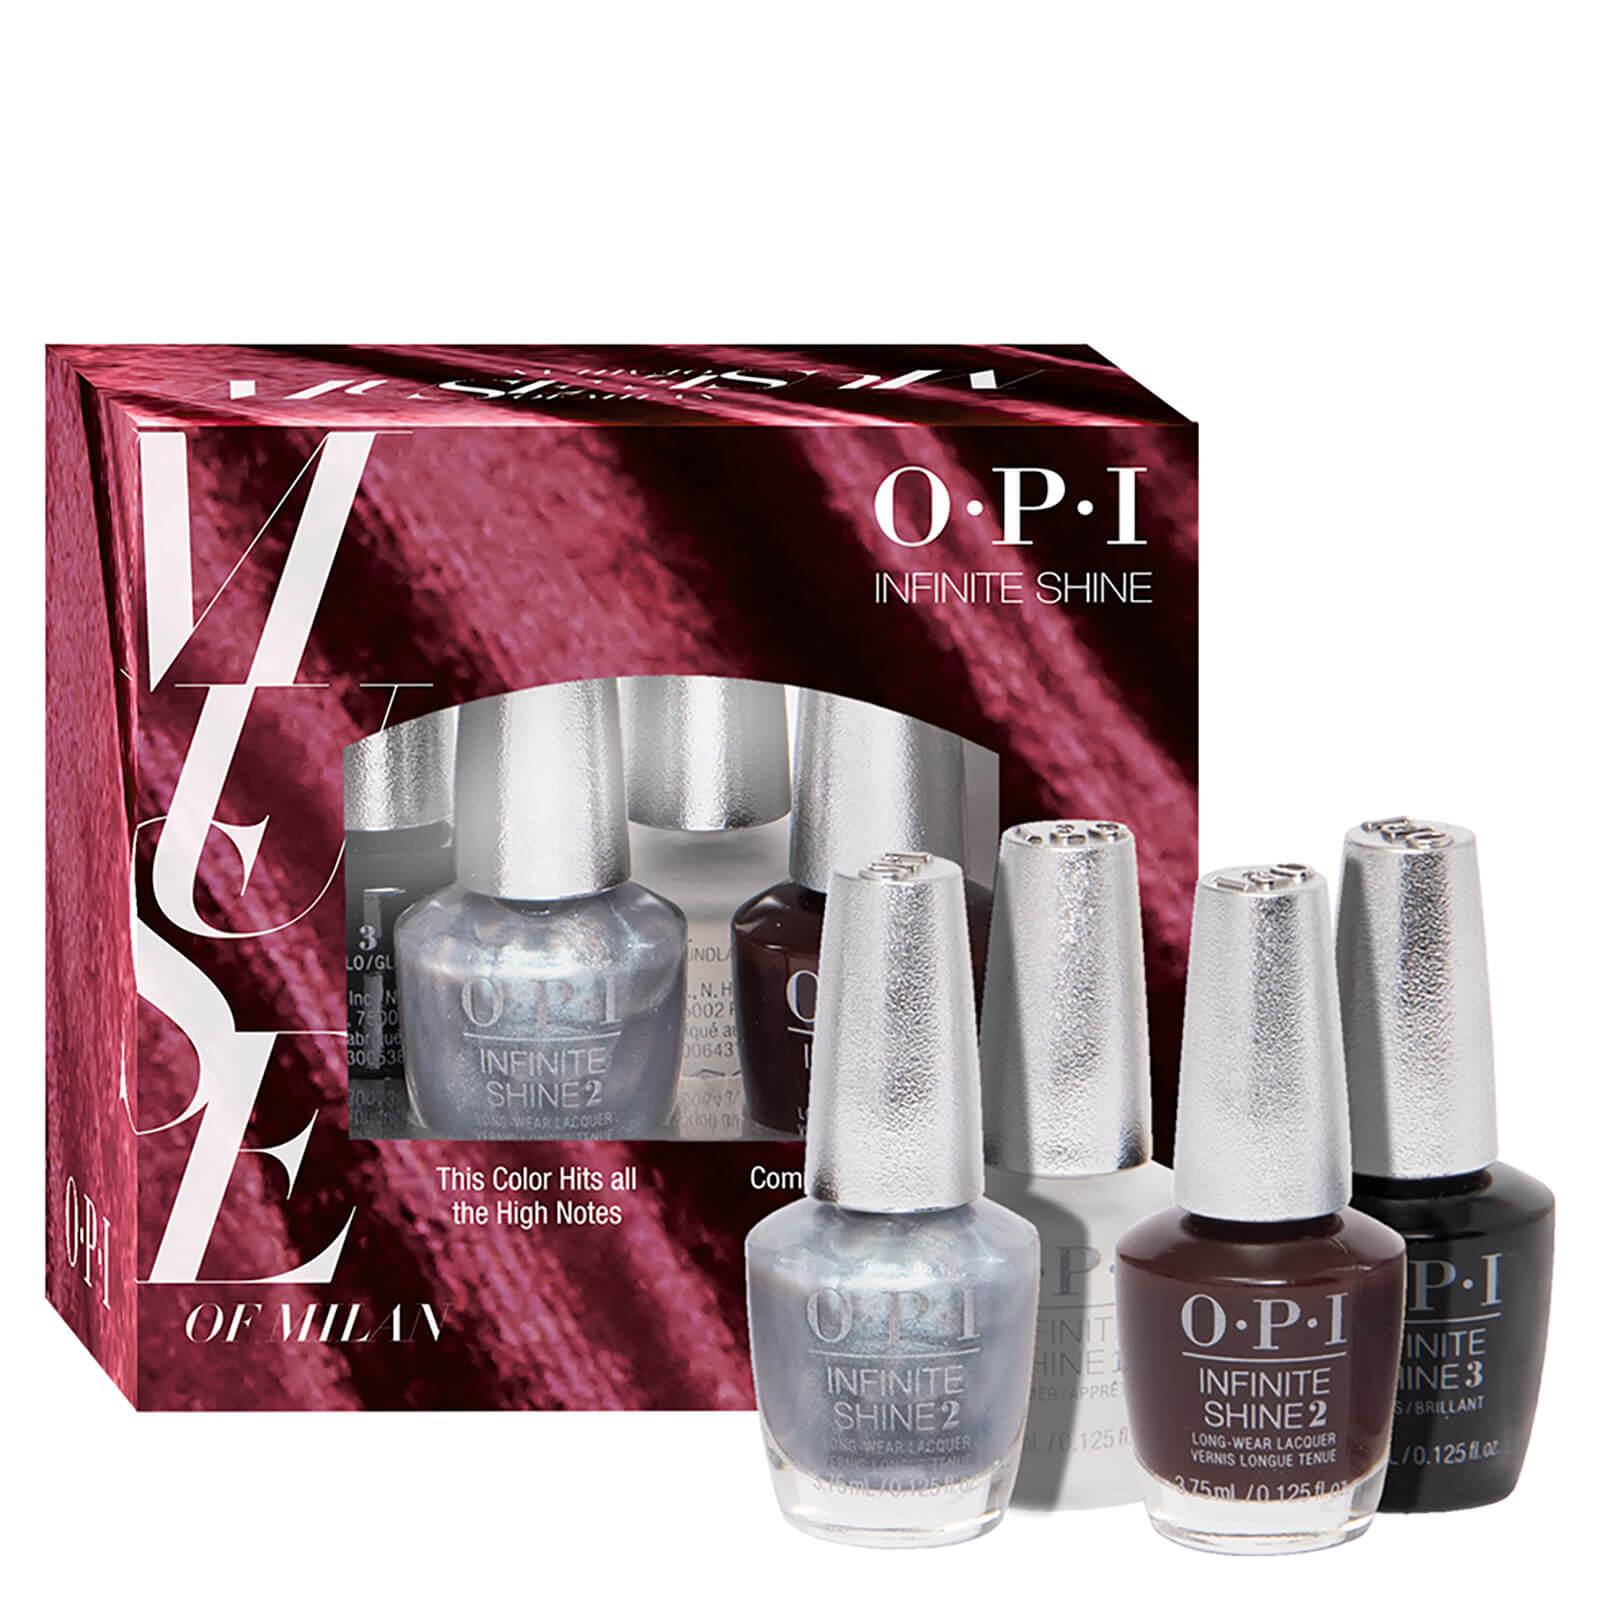 OPI Muse Of Milan Collection Infinite Shine Nail Polish 15ml